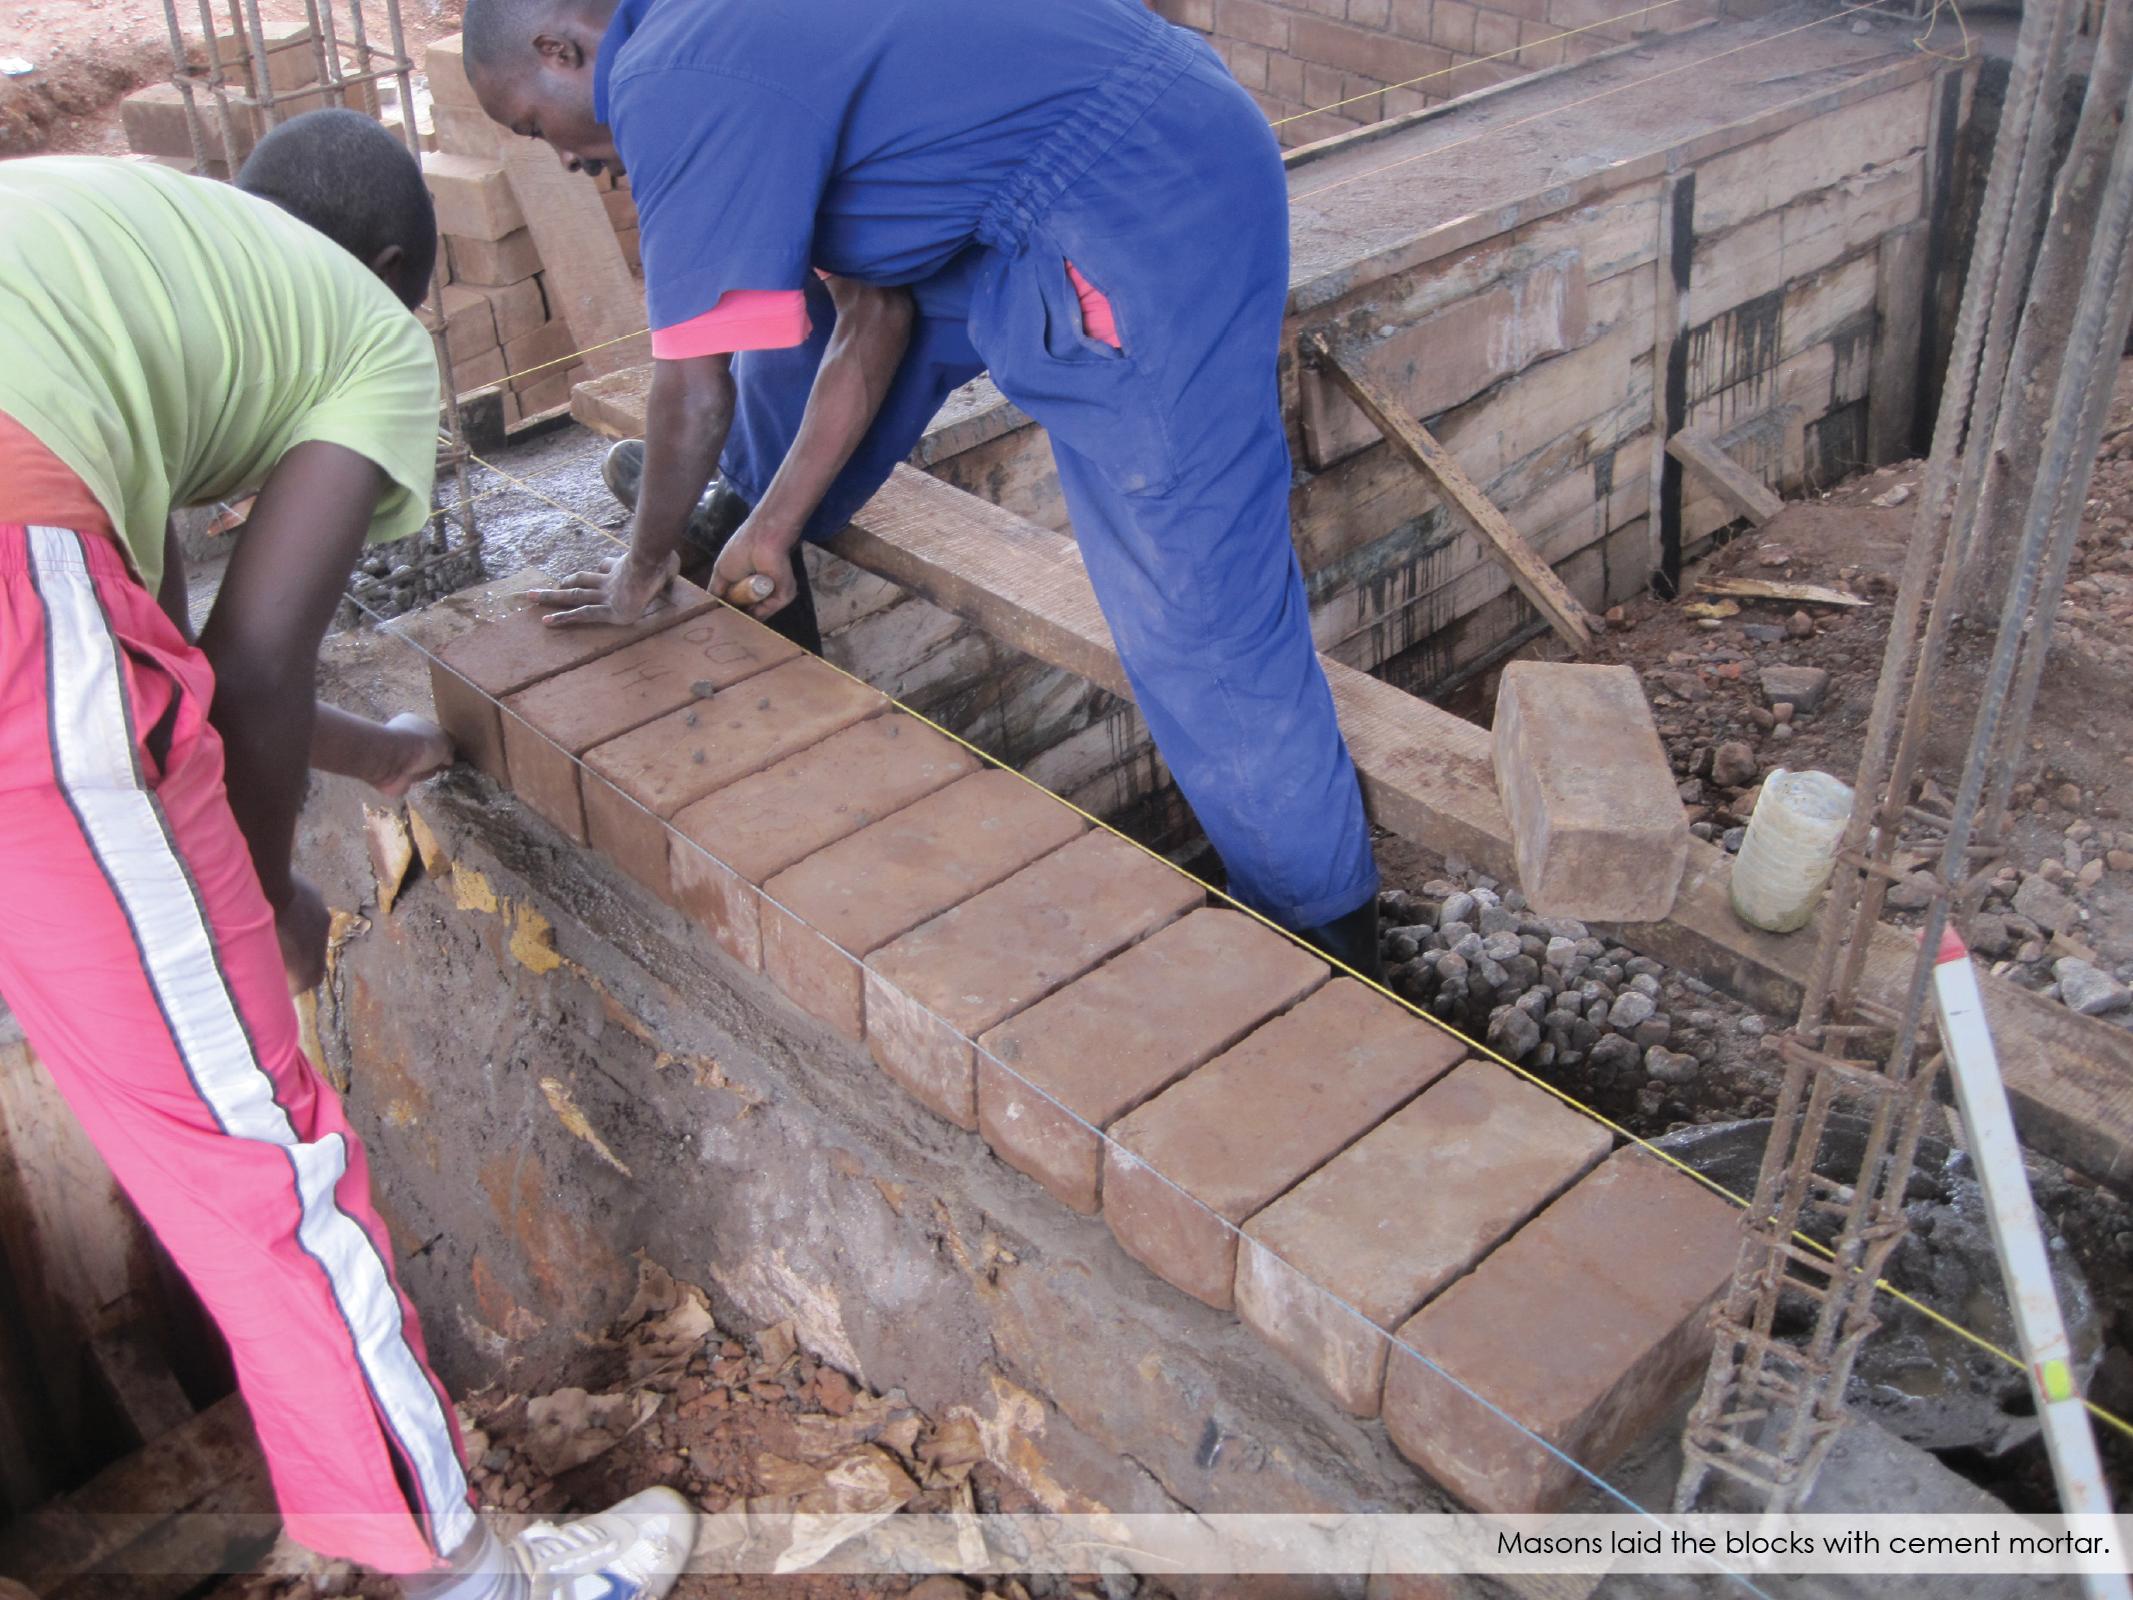 Gaugler_RwandaExperience_p24.jpg